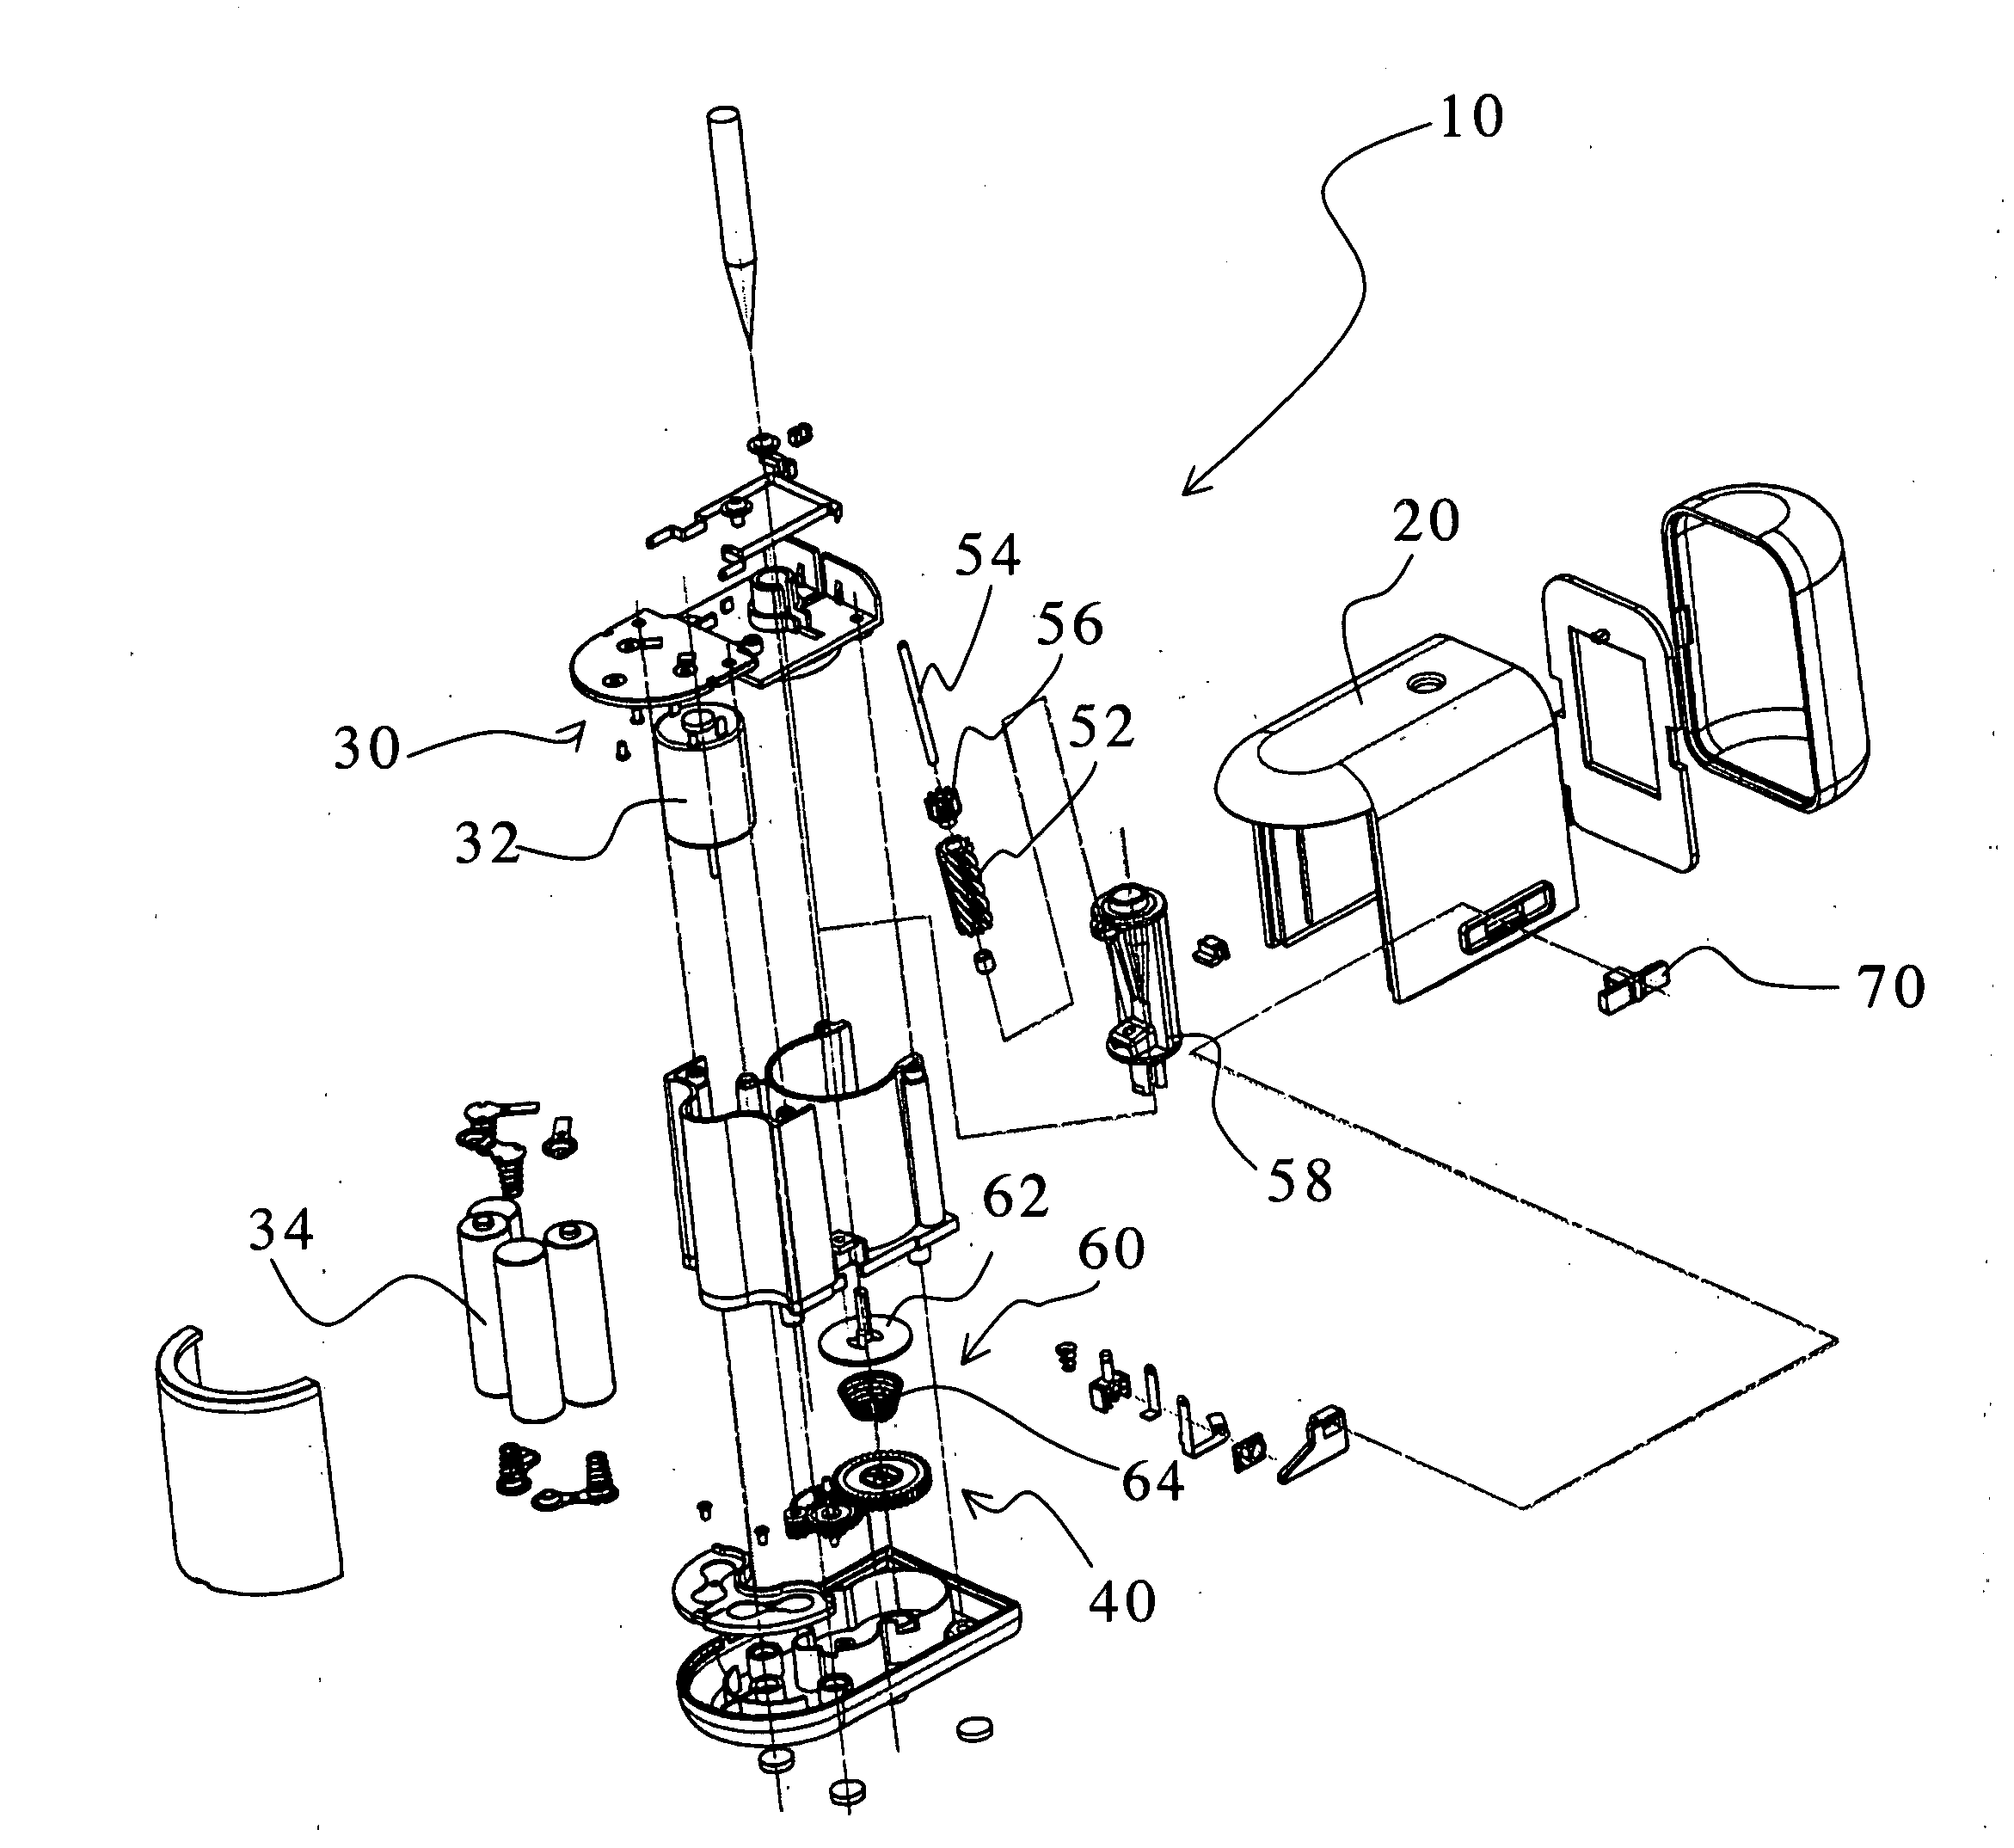 apc mini chopper wiring diagram 2000 vw jetta vr6 fuse box 49cc diagrams